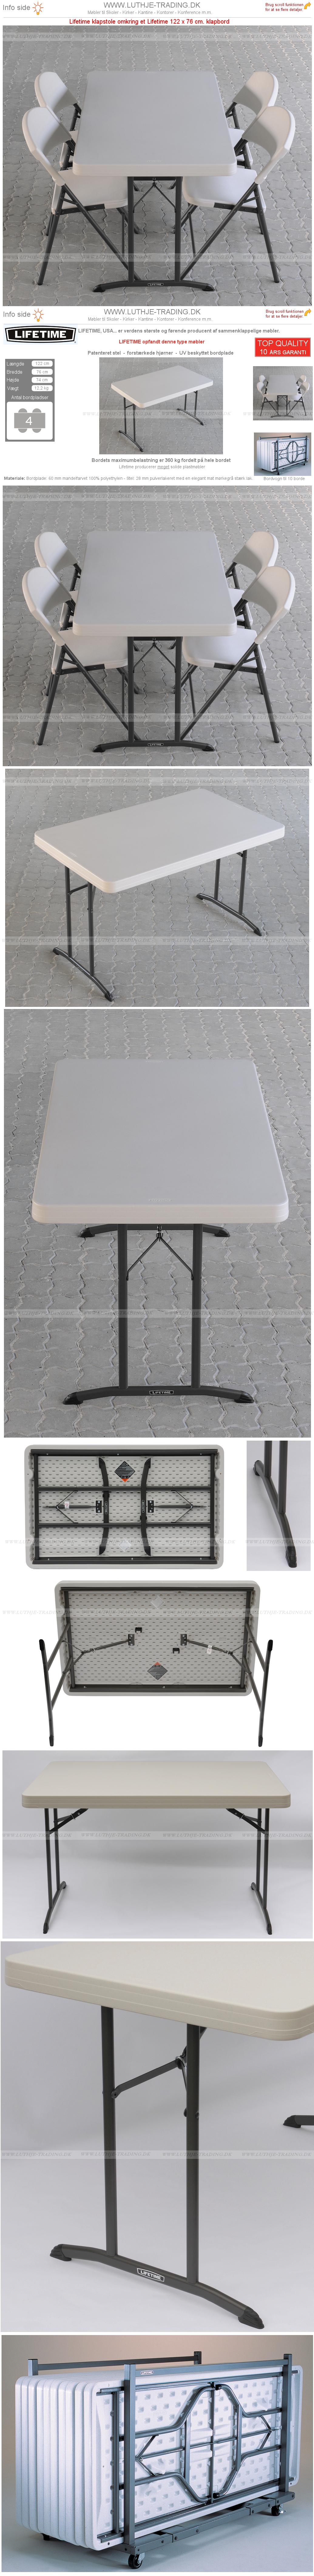 Klapstol med Lifetime klapbord 122 x 76 cm.